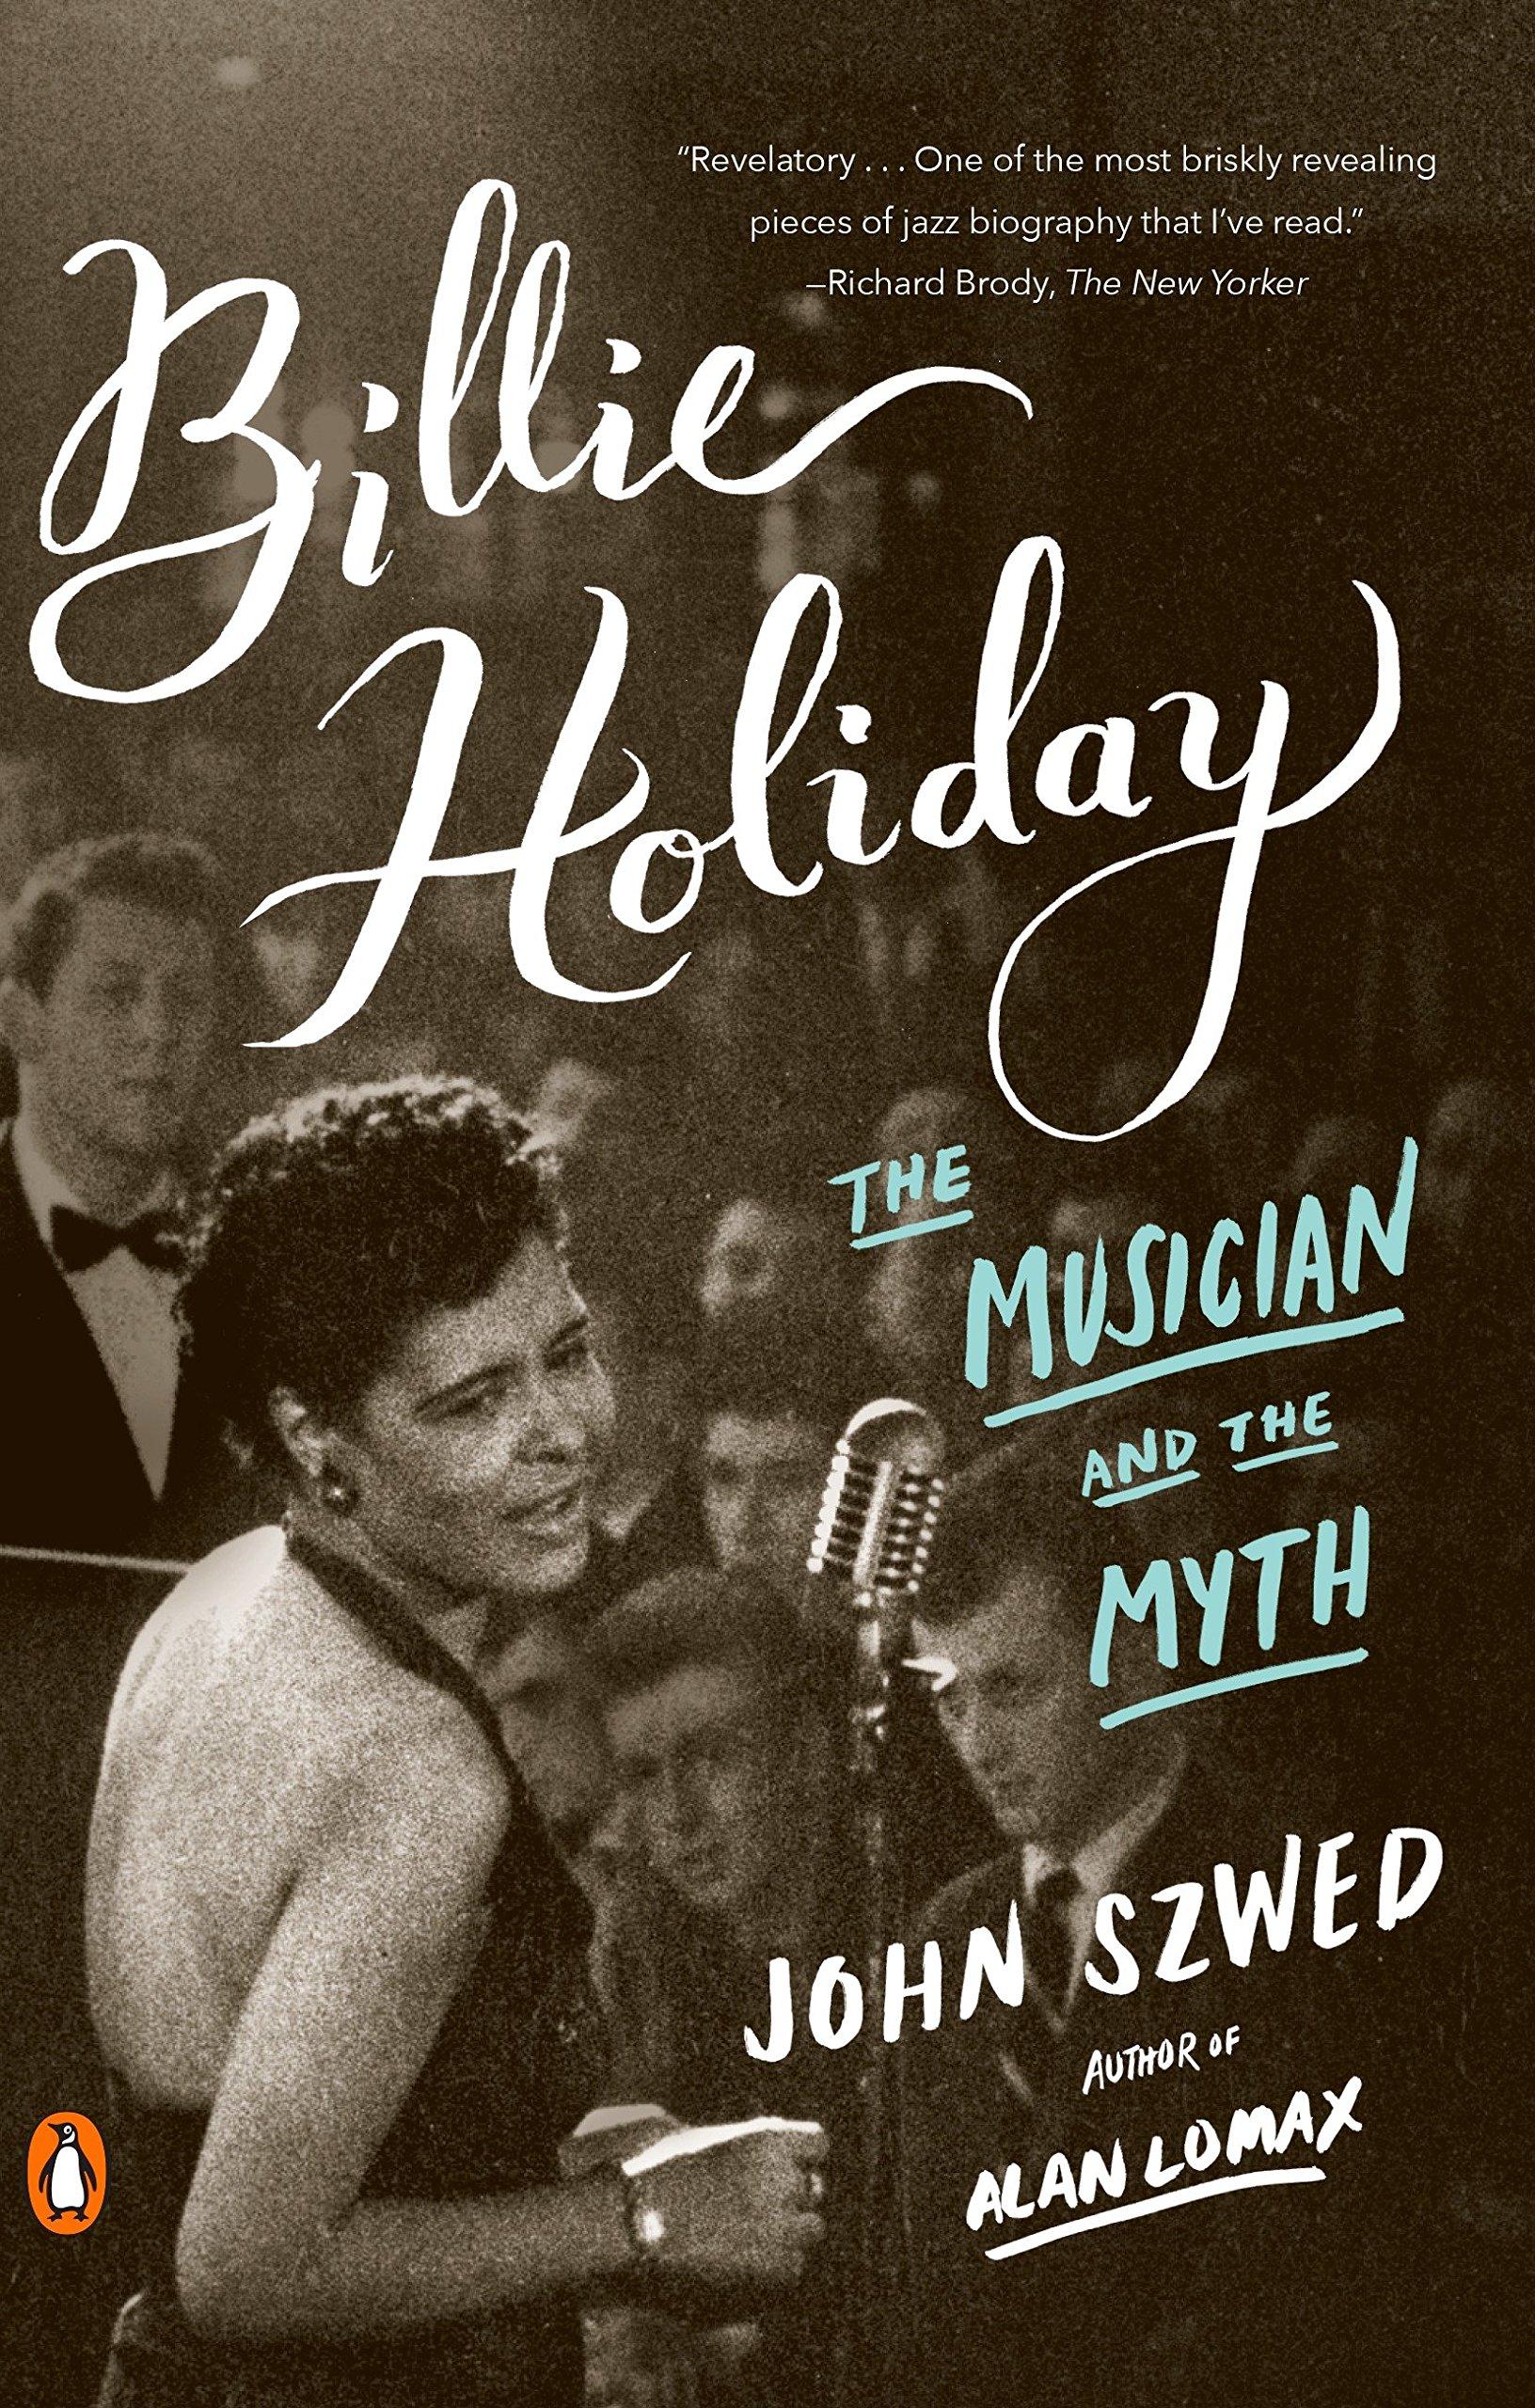 Billie Holiday: The Musician and the Myth: John Szwed: 9780143107965:  Amazon.com: Books